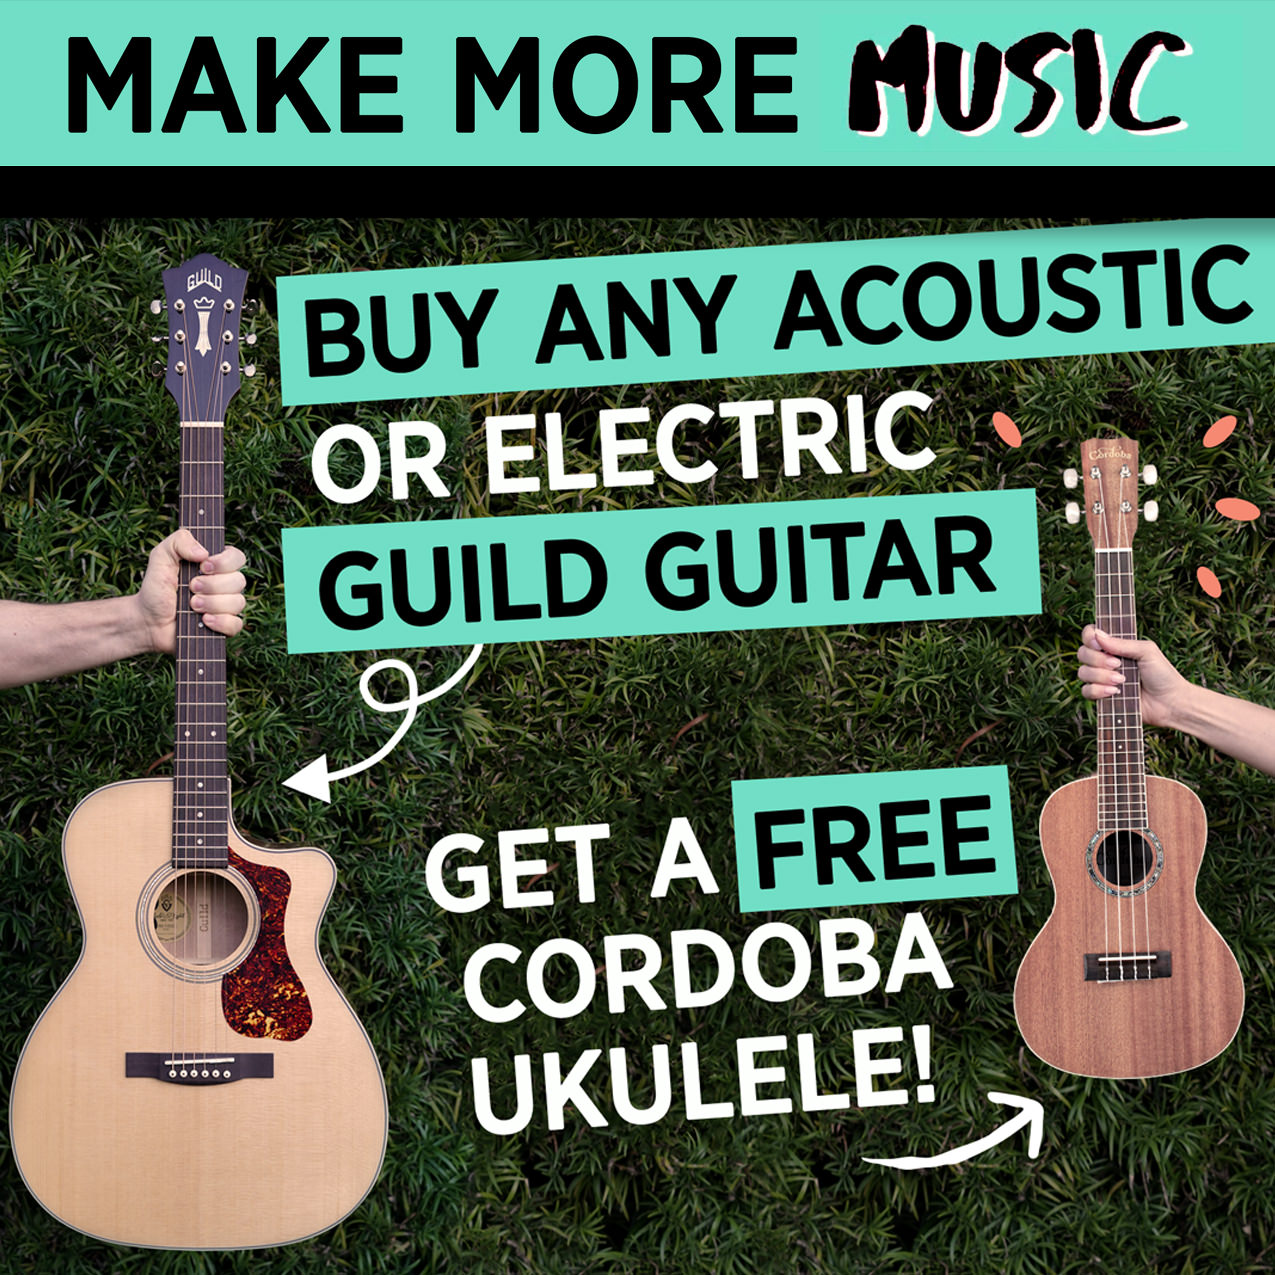 Make More Music!